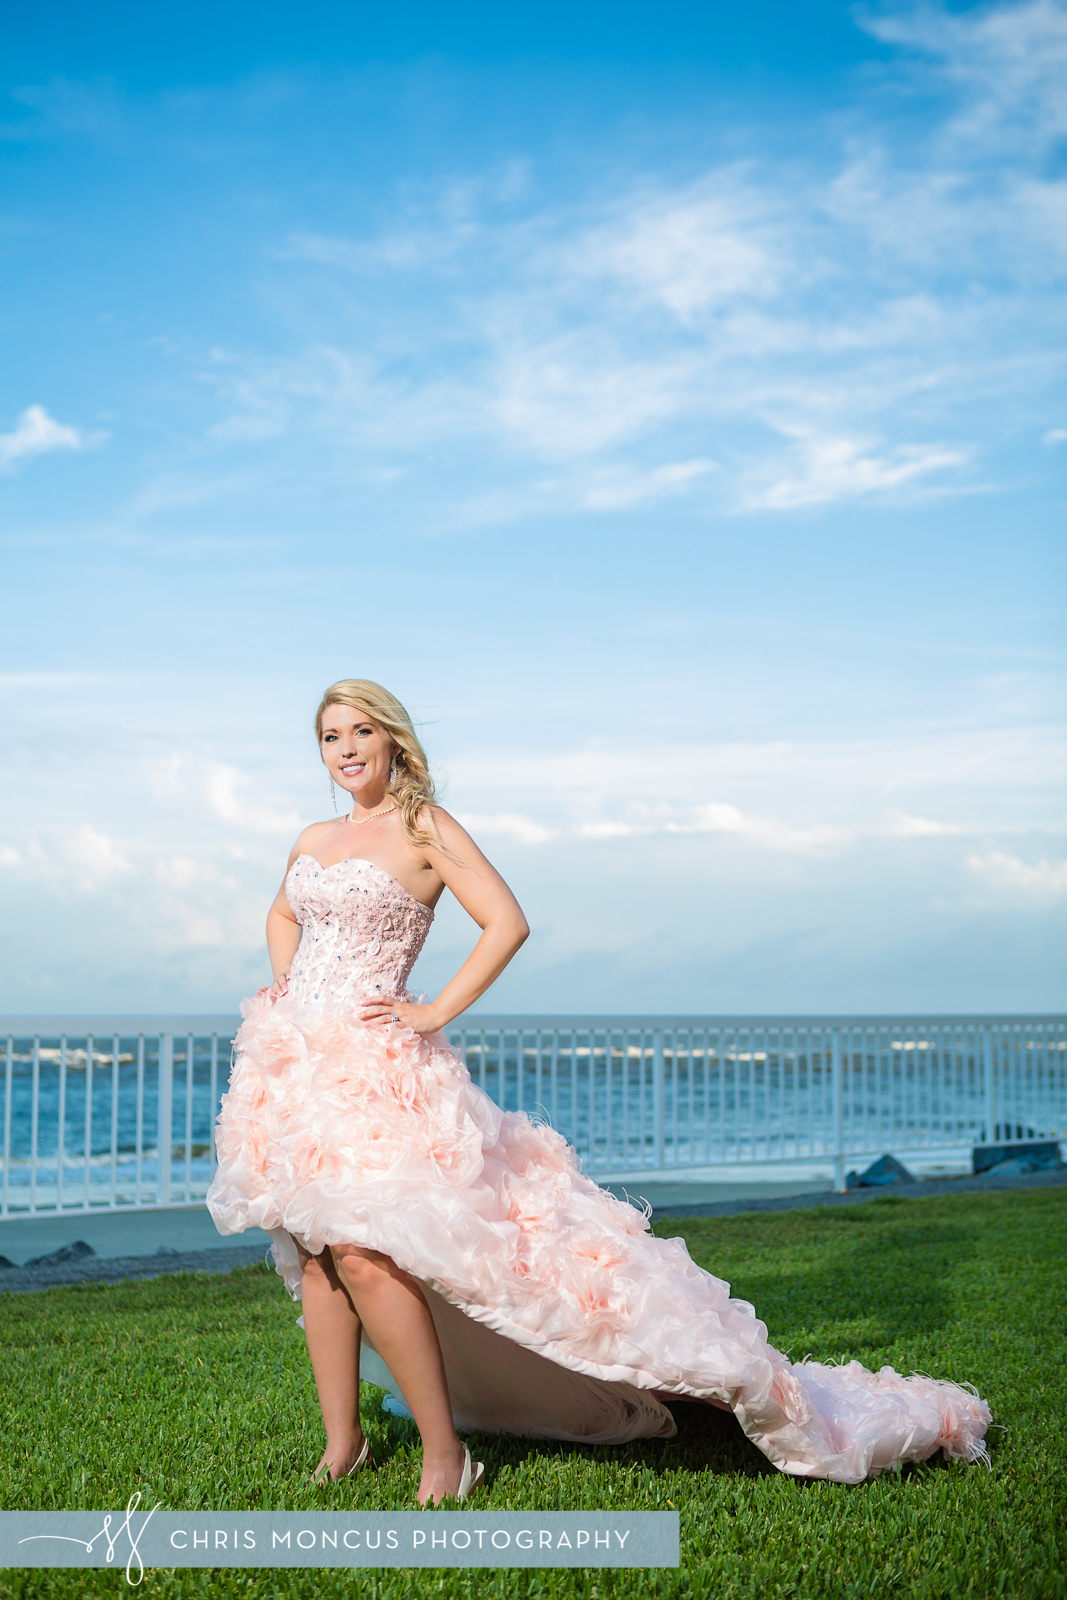 Chris Moncus Photography - Wedding, Senior, and Family Photographer ...